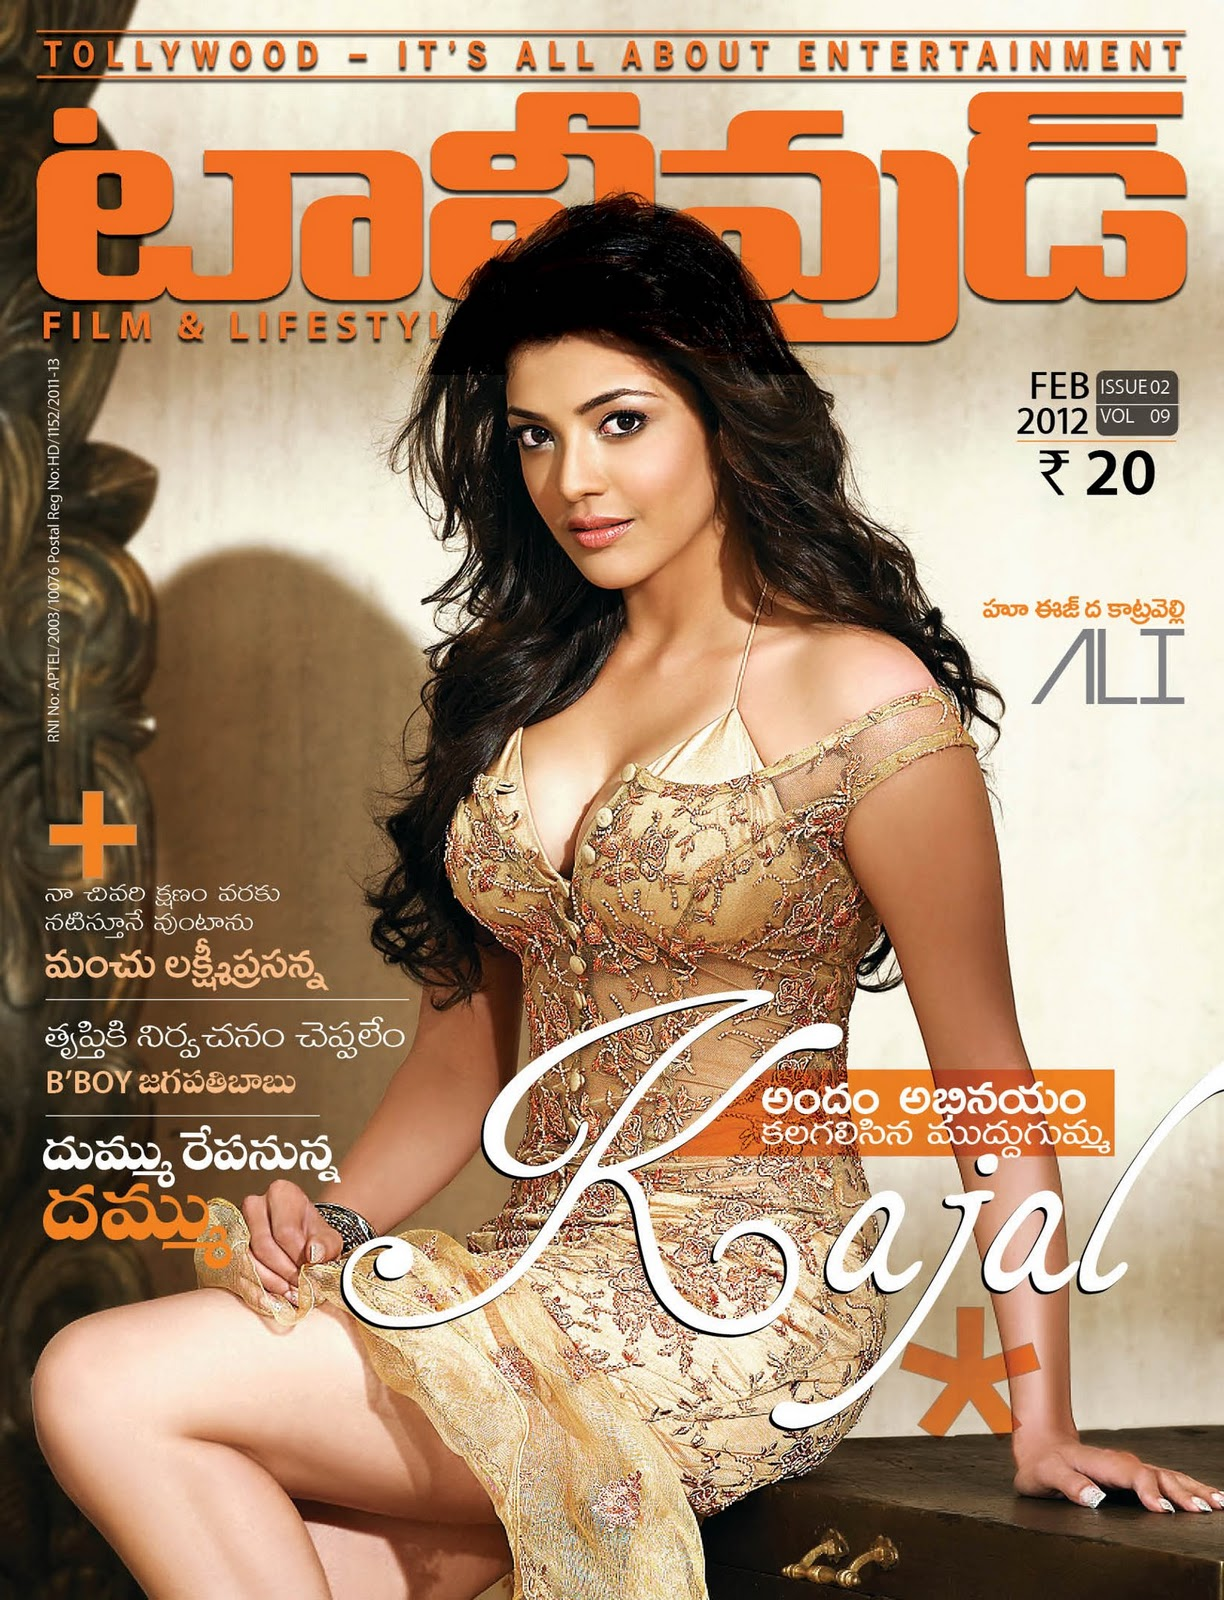 Wallpaper: Hot On Tollywood Magazine in Tamil Actress Kajal Agarwal ...